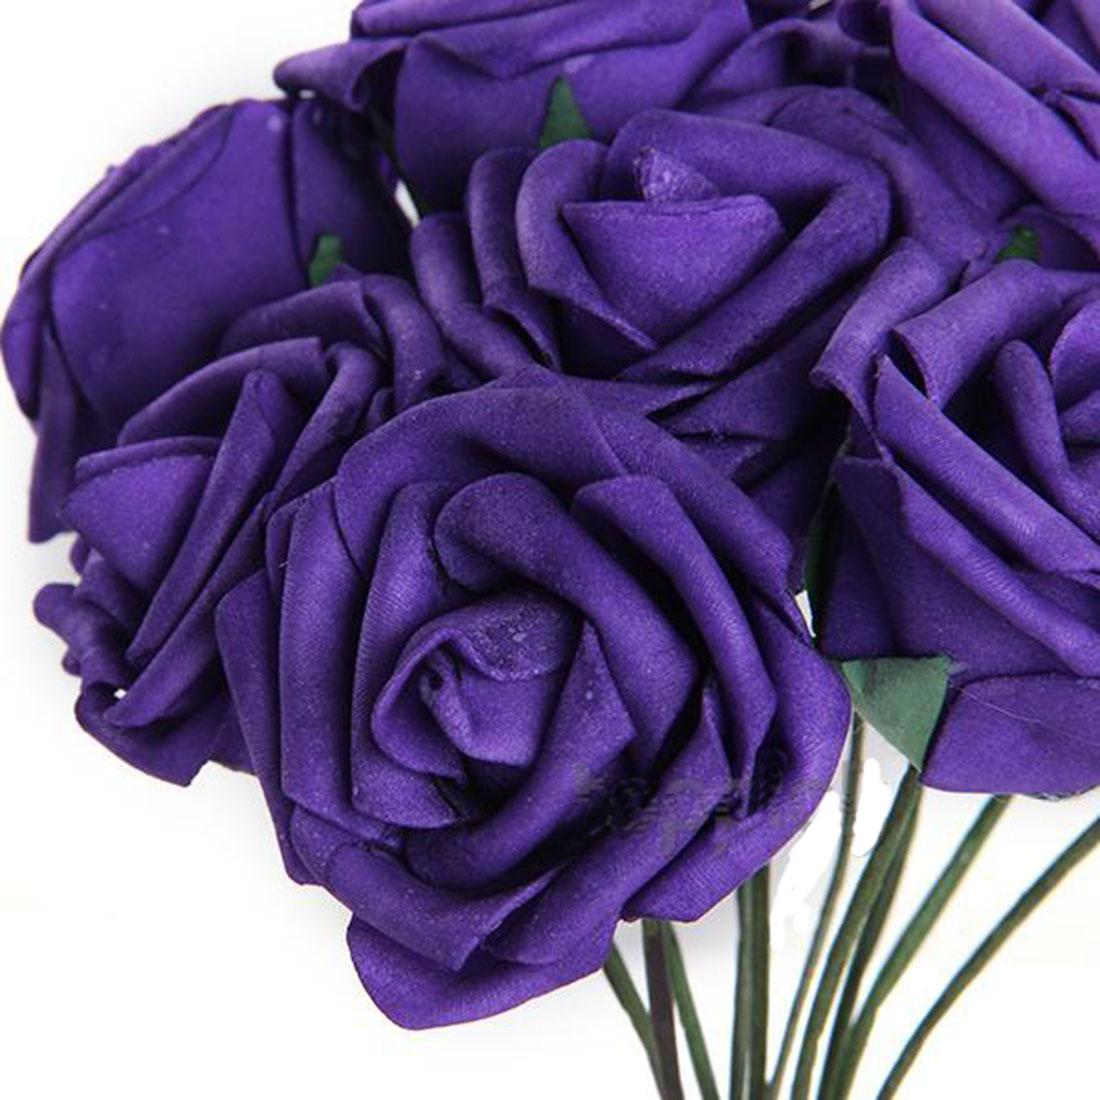 Oscuras flores de color púrpura de la boda